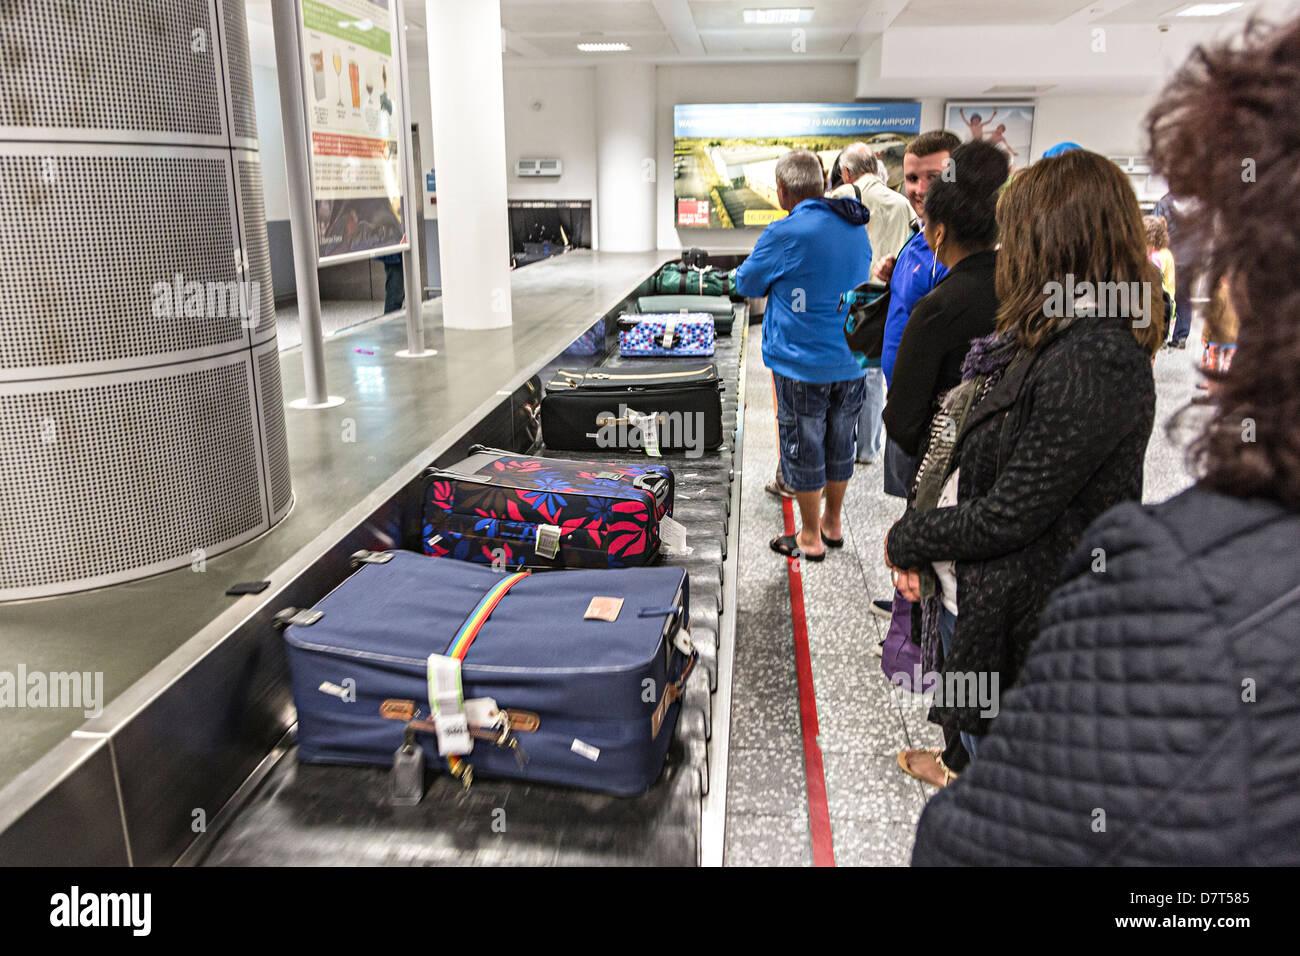 Passengers waiting to reclaim luggage at Bristol airport, UK - Stock Image